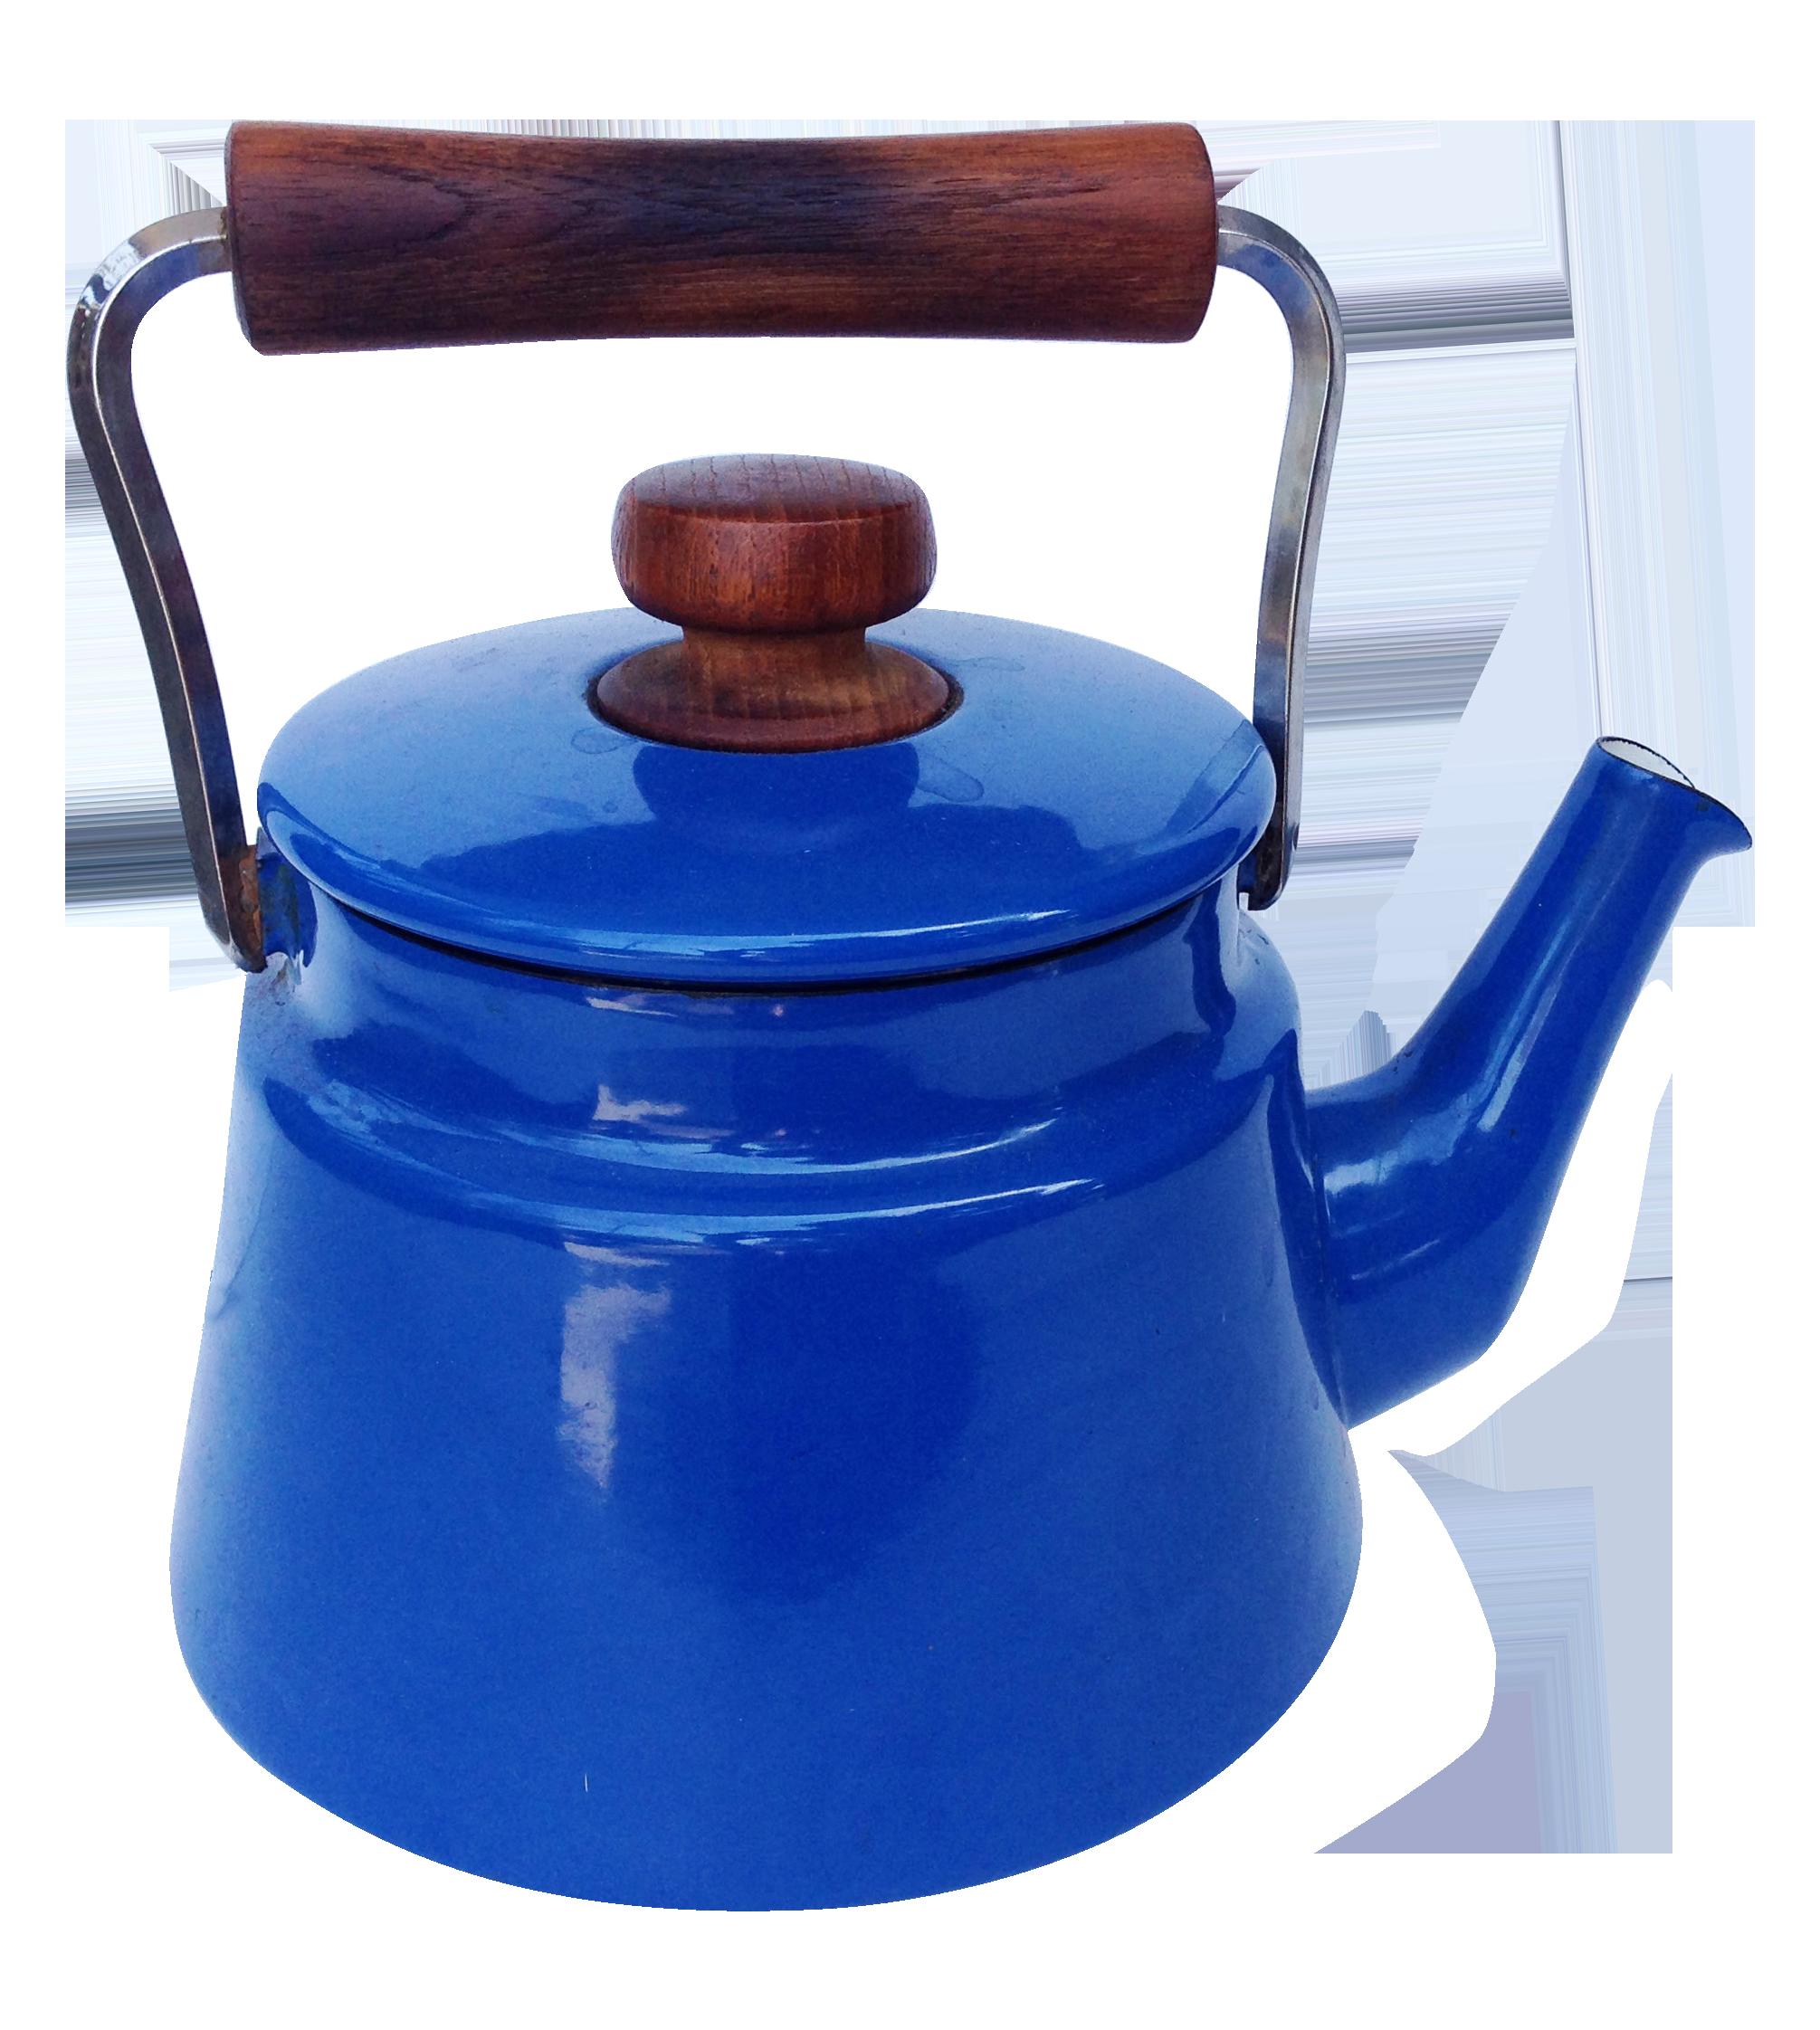 jens quistgaard blue dansk kobenstyle tea kettle  Ürünler Çaylar  - jens quistgaard blue dansk kobenstyle tea kettle on chairishcom